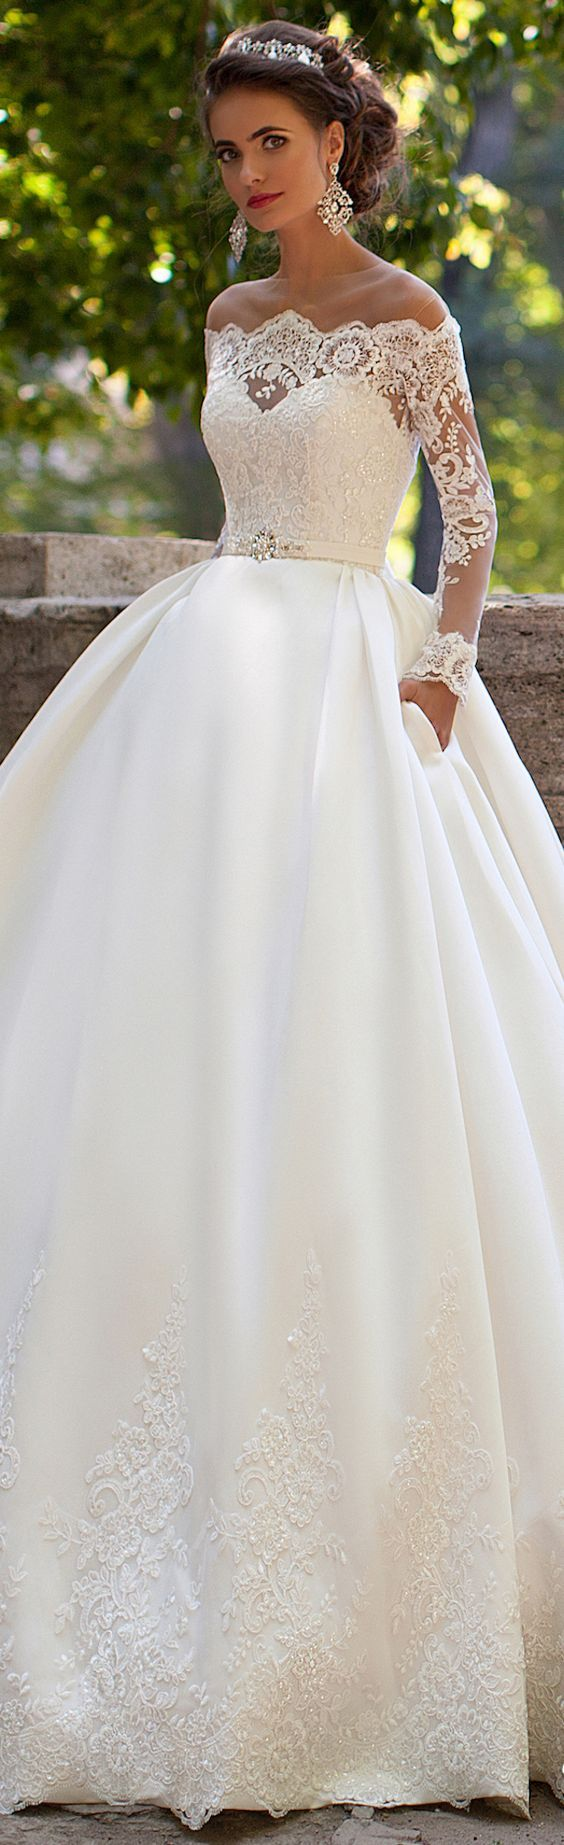 Milla Nova 2016 off shoulder long sleeves wedding dresses